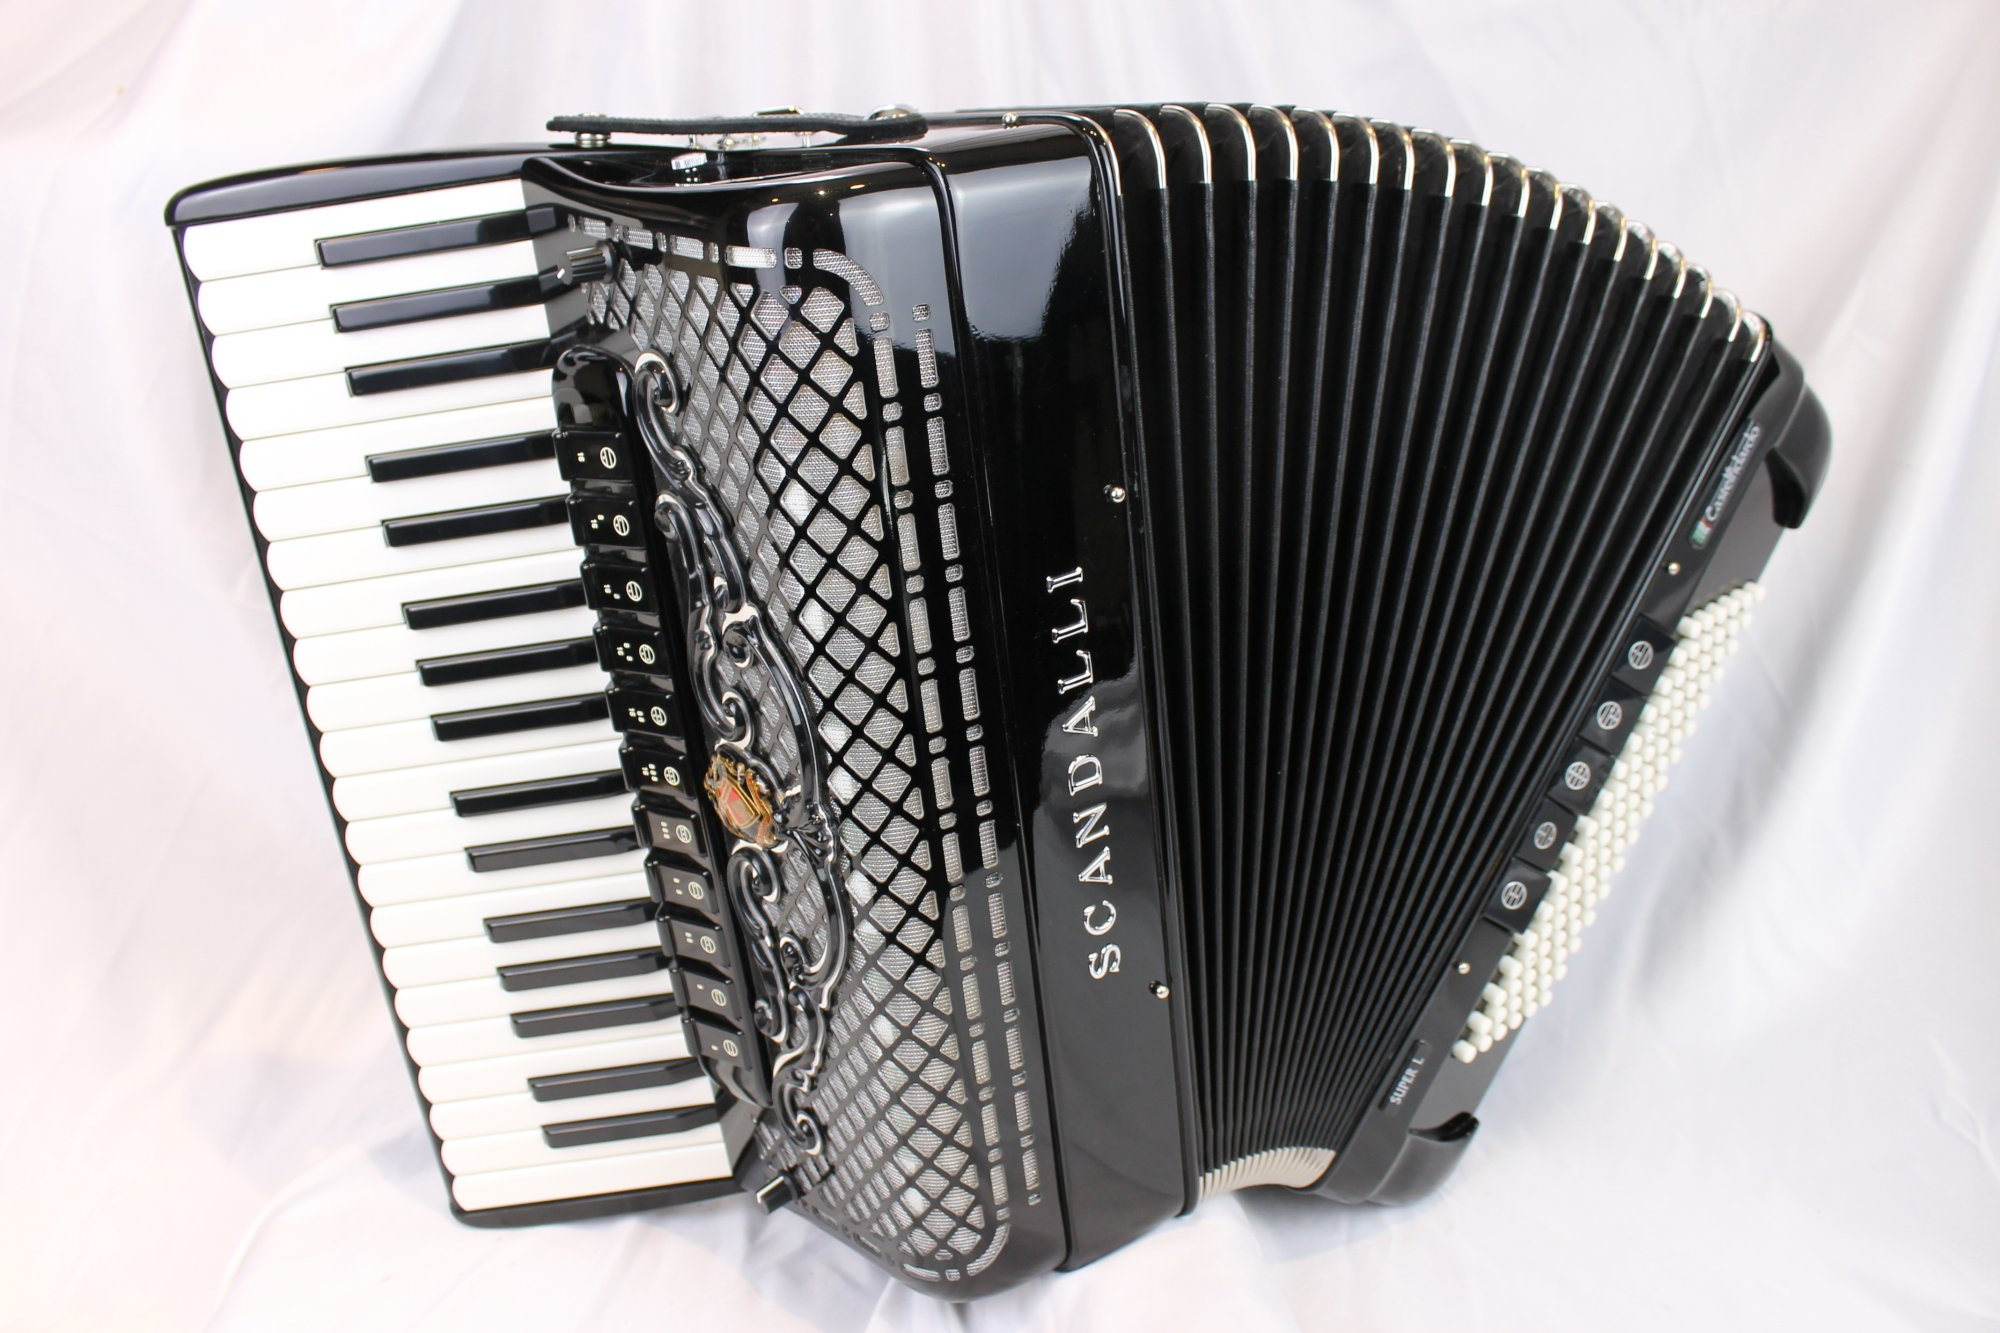 5036 - Like New Black Scandalli Super L Piano Accordion LMMM 37 96